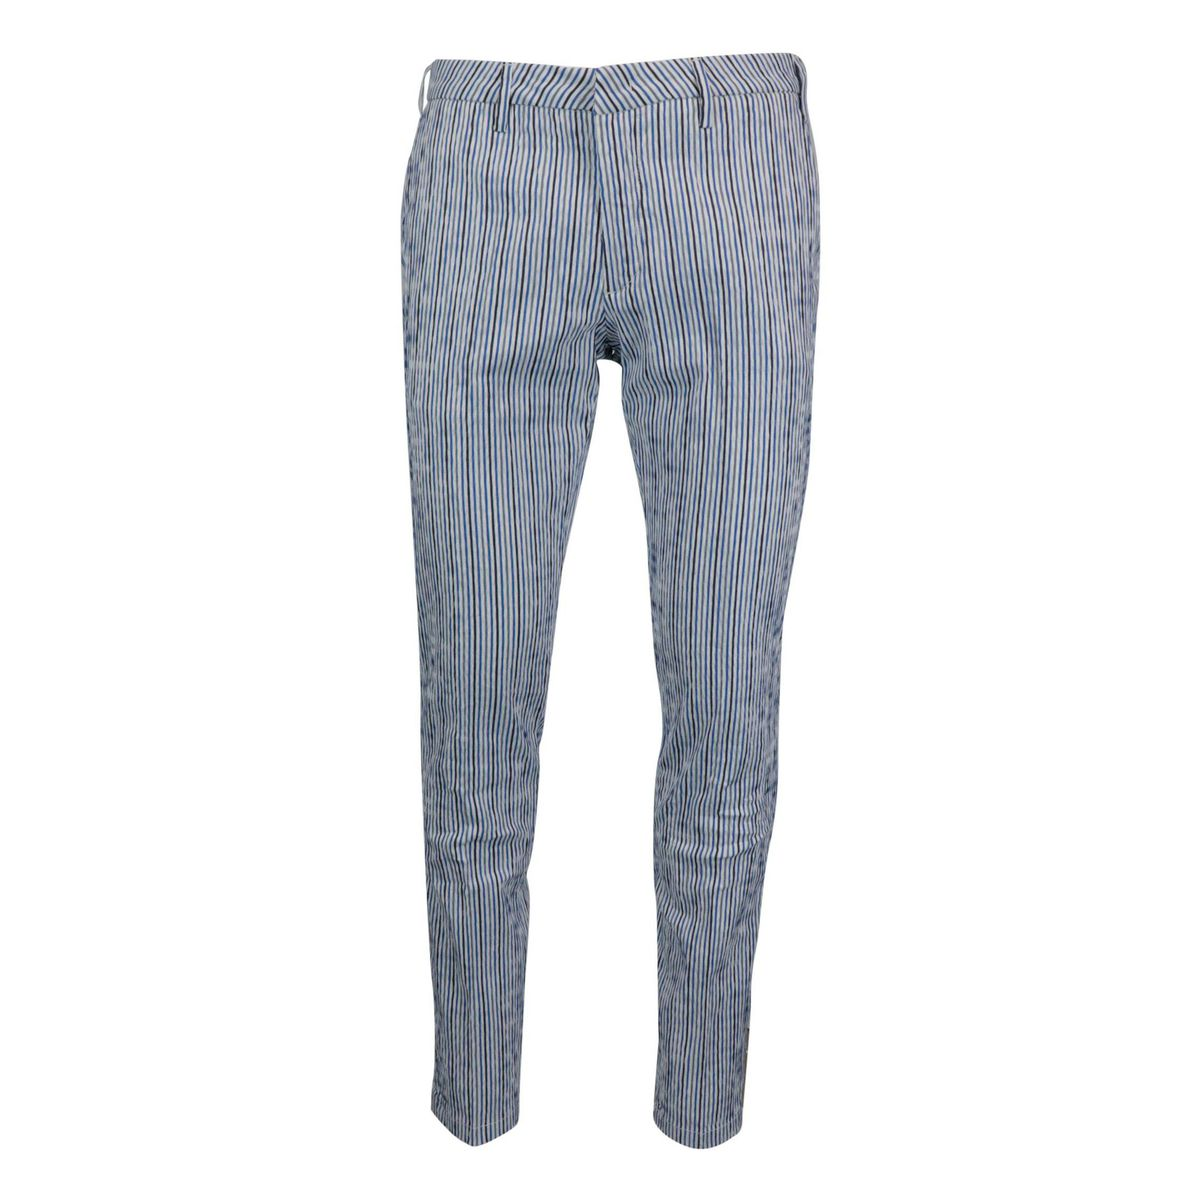 Slim-fit striped seersucker cotton trousers White / blue Baronio